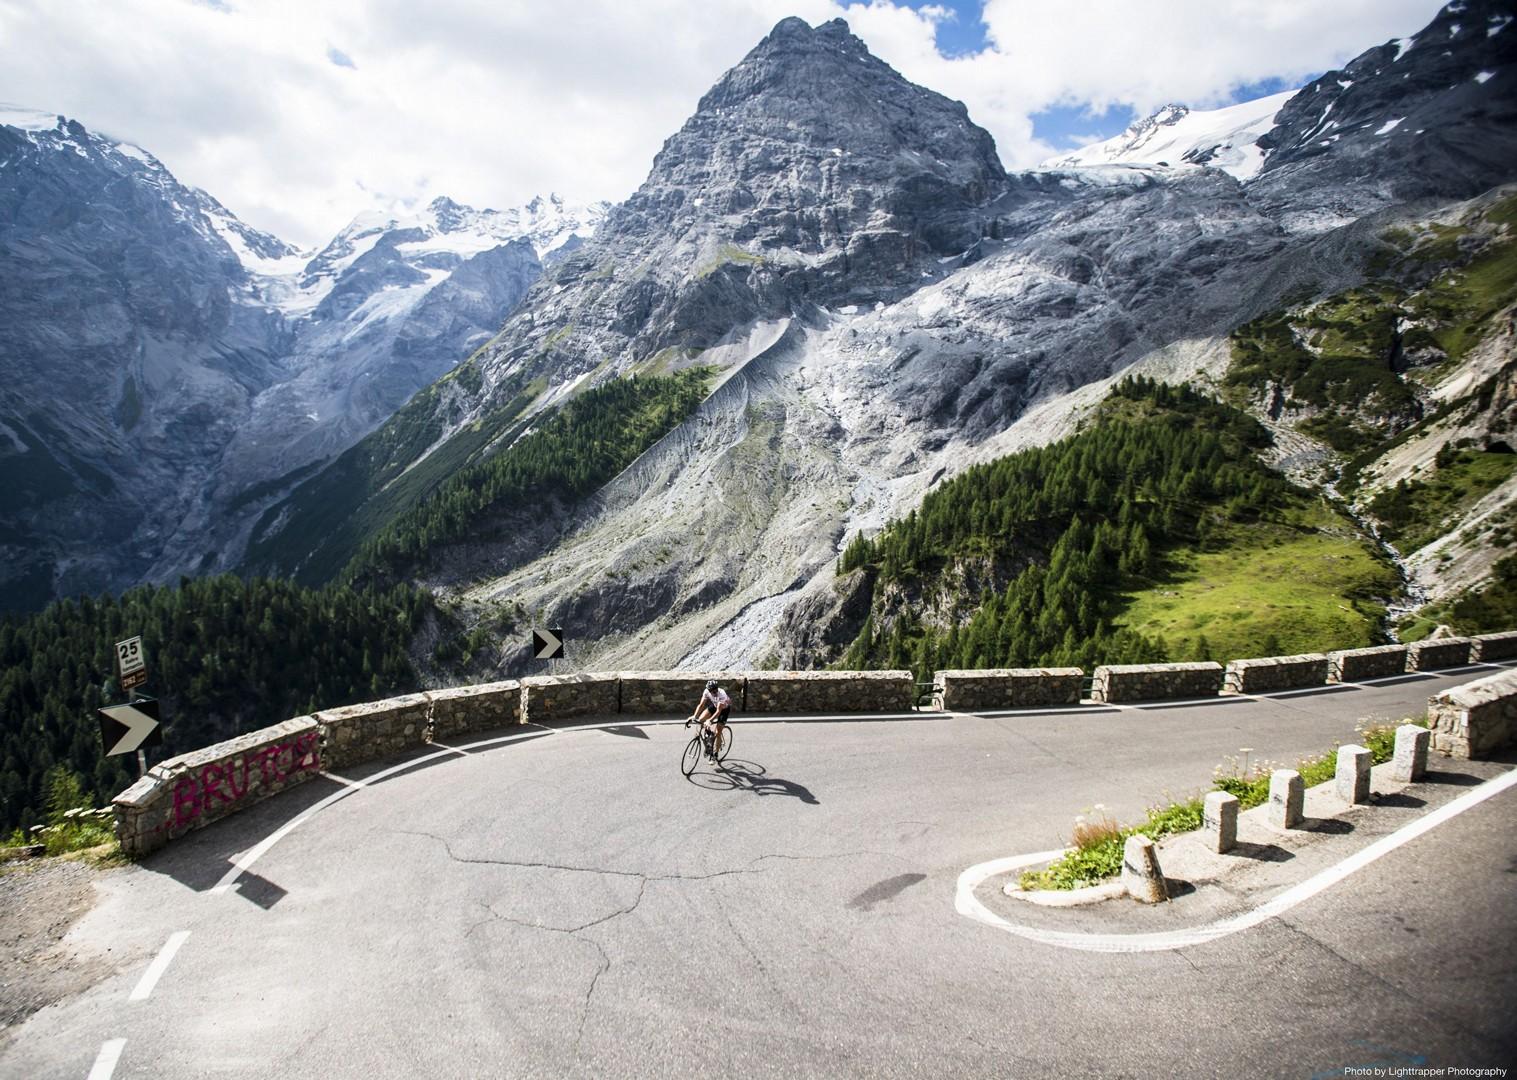 italy-italian-alps-guided-road-cycling-holiday.jpg - Italy - Italian Alps - Guided Road Cycling Holiday - Italia Road Cycling